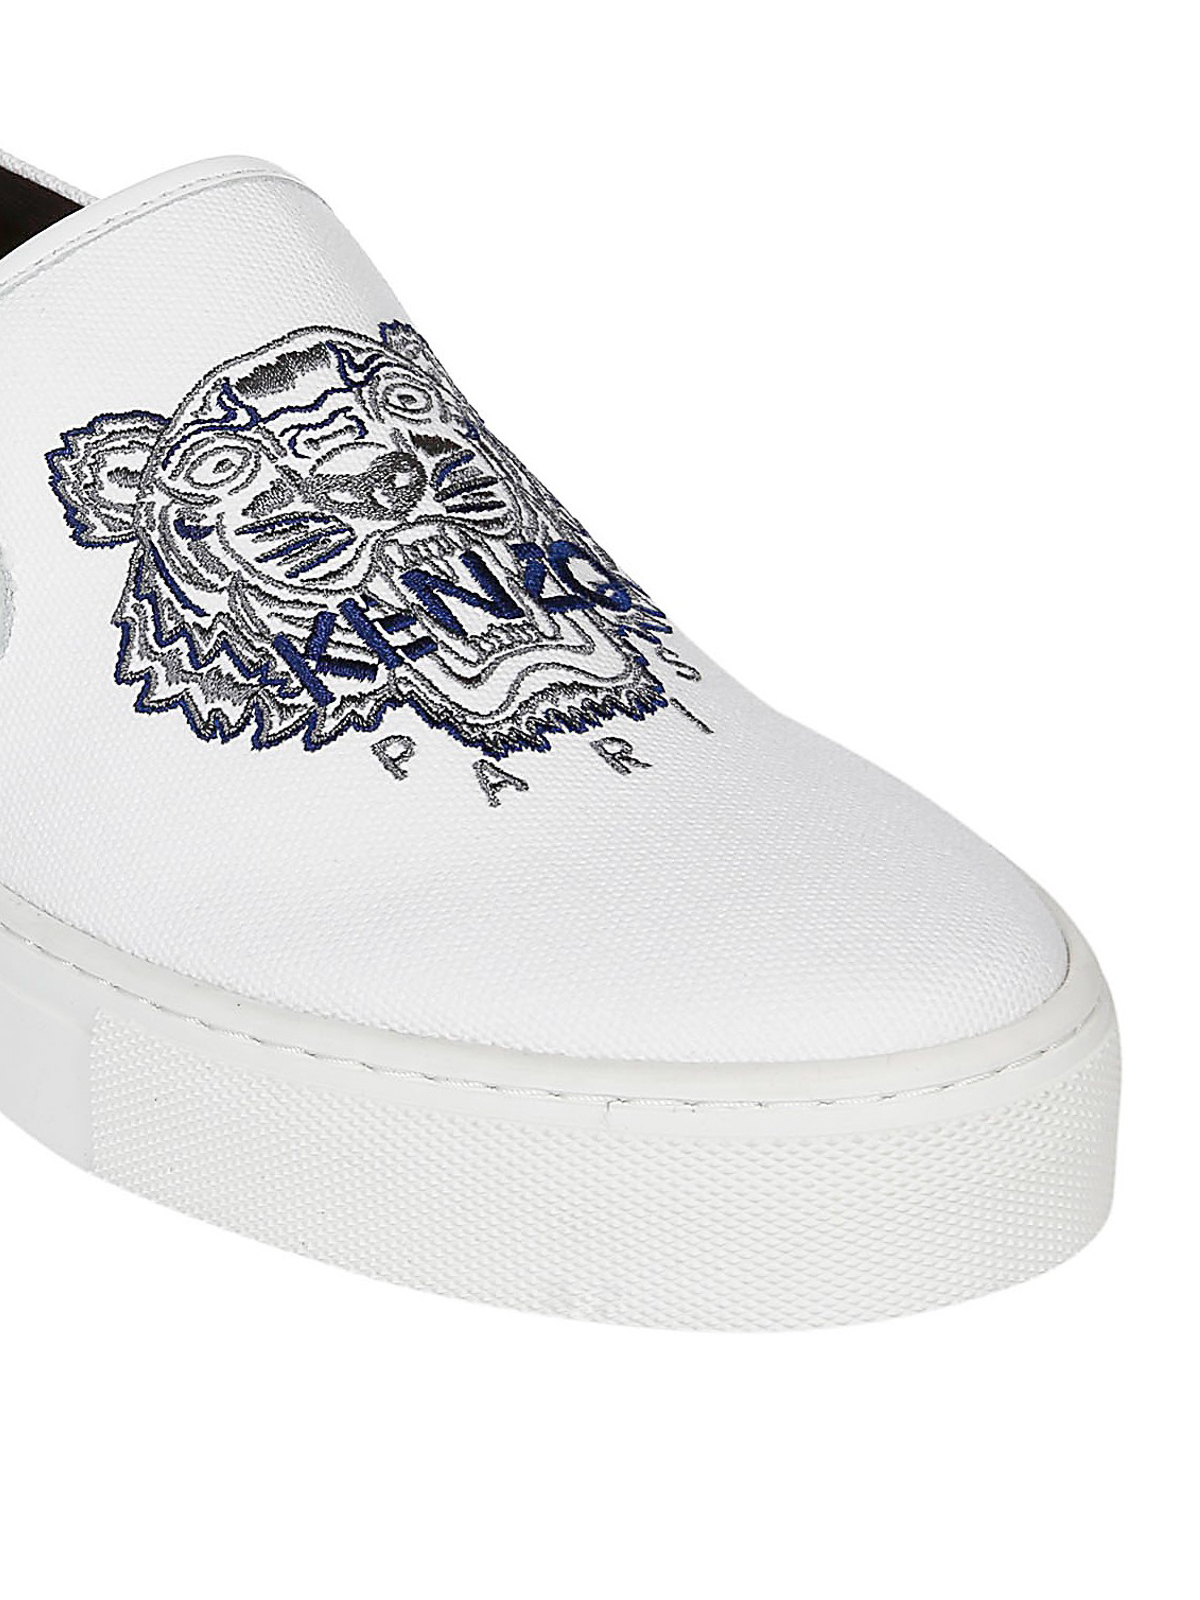 K-Skate Tiger canvas slip on sneakers